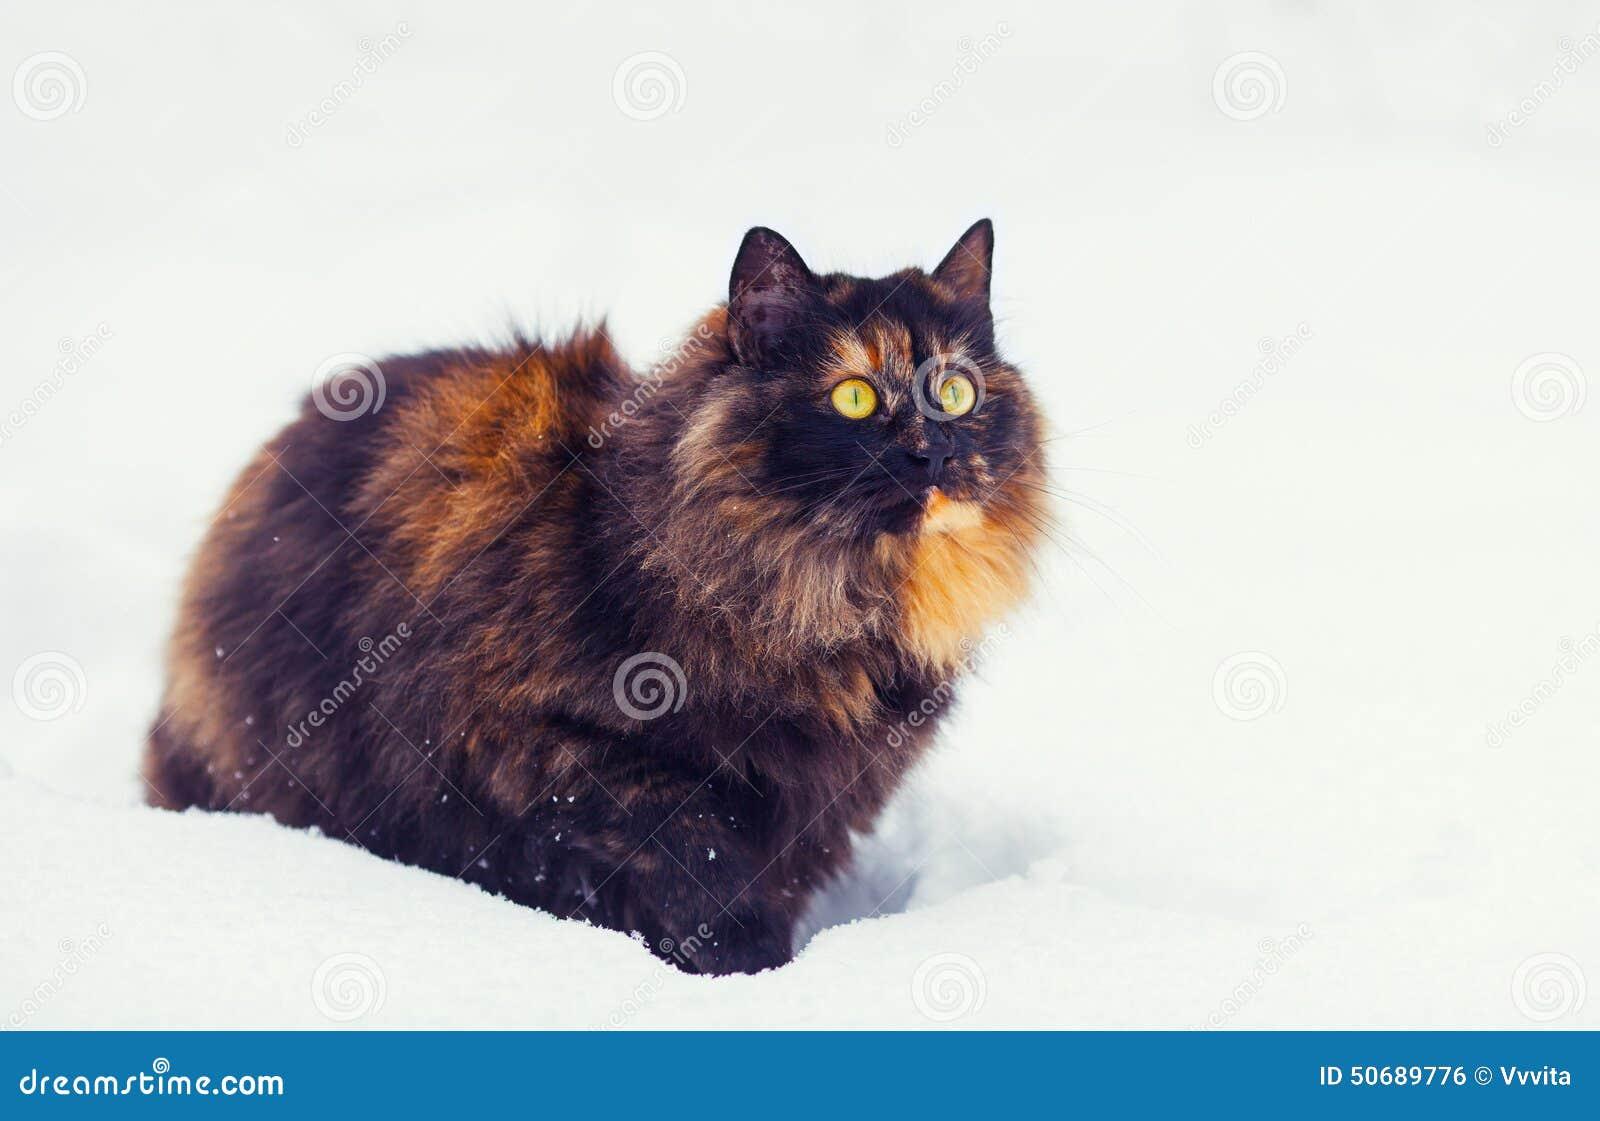 Download 在雪的猫 库存照片. 图片 包括有 空白, 季节性, 季节, 不可靠, 背包, 雪花, 室外, 冷静, 小猫 - 50689776